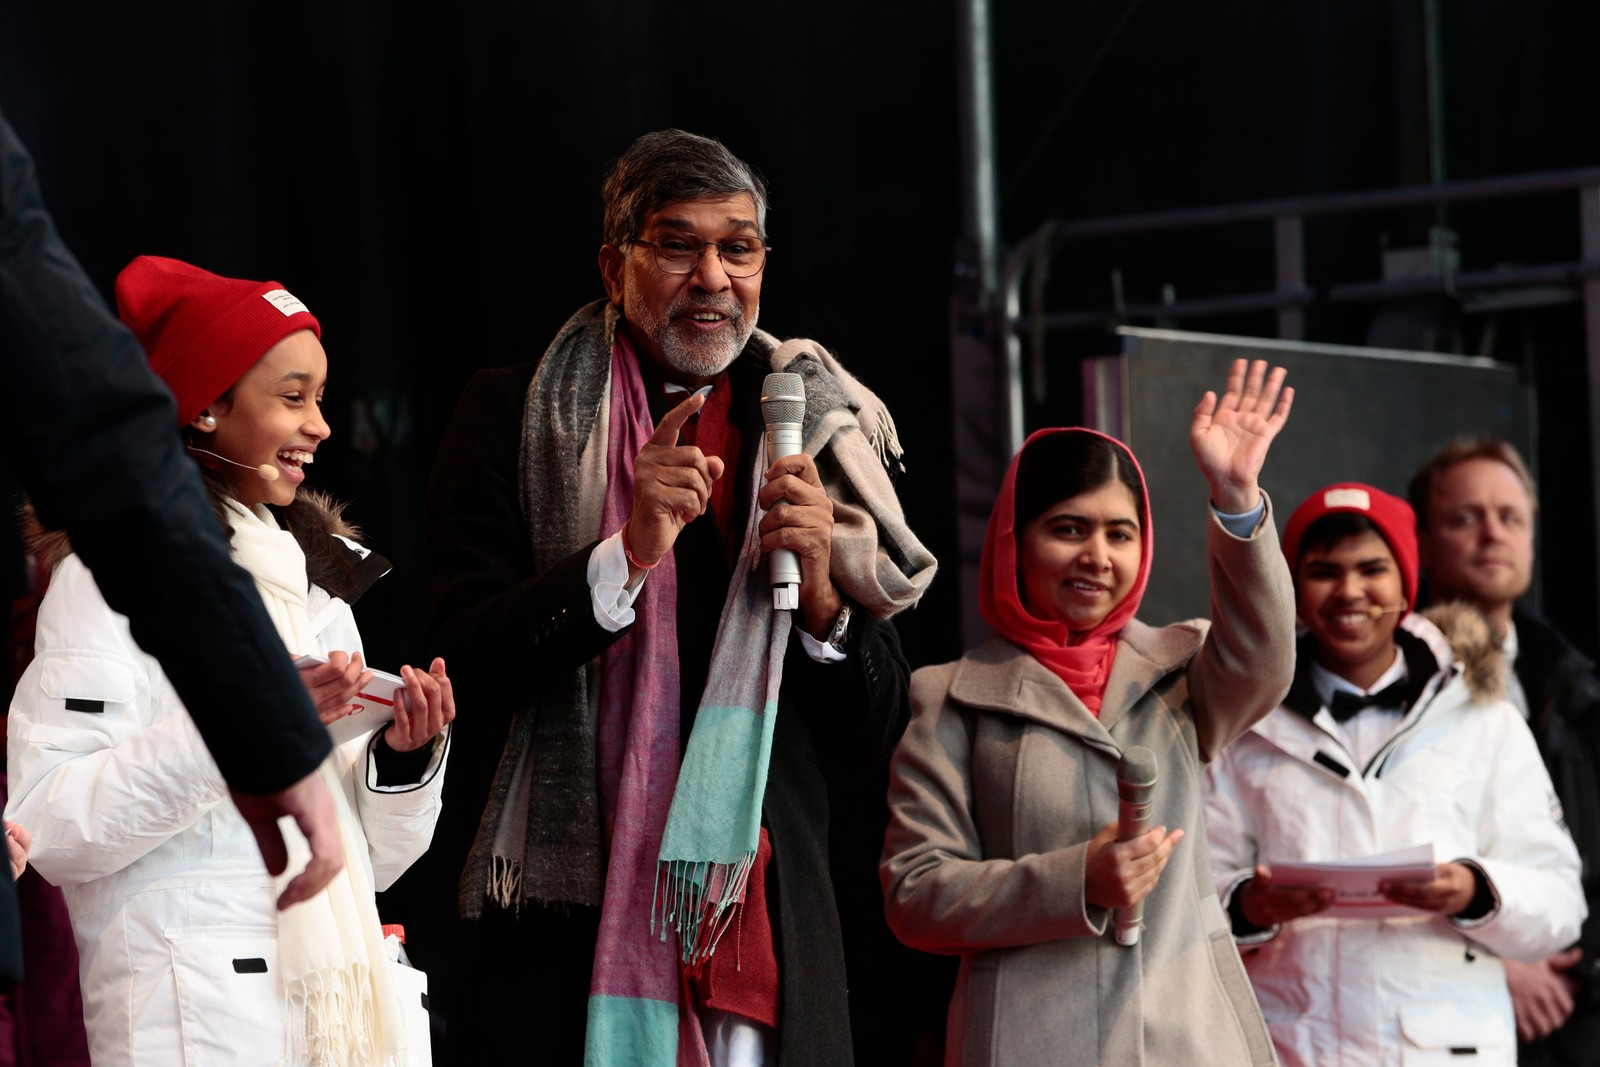 PÅ SCENEN I OSLO: Fredsprisvinnerne Malala Yousafzai og Kailash Satyarthi møter flere tusen skolebarn under Redd Barnas fredsprisfest utenfor Nobels Fredssenter i Oslo onsdag formiddag.